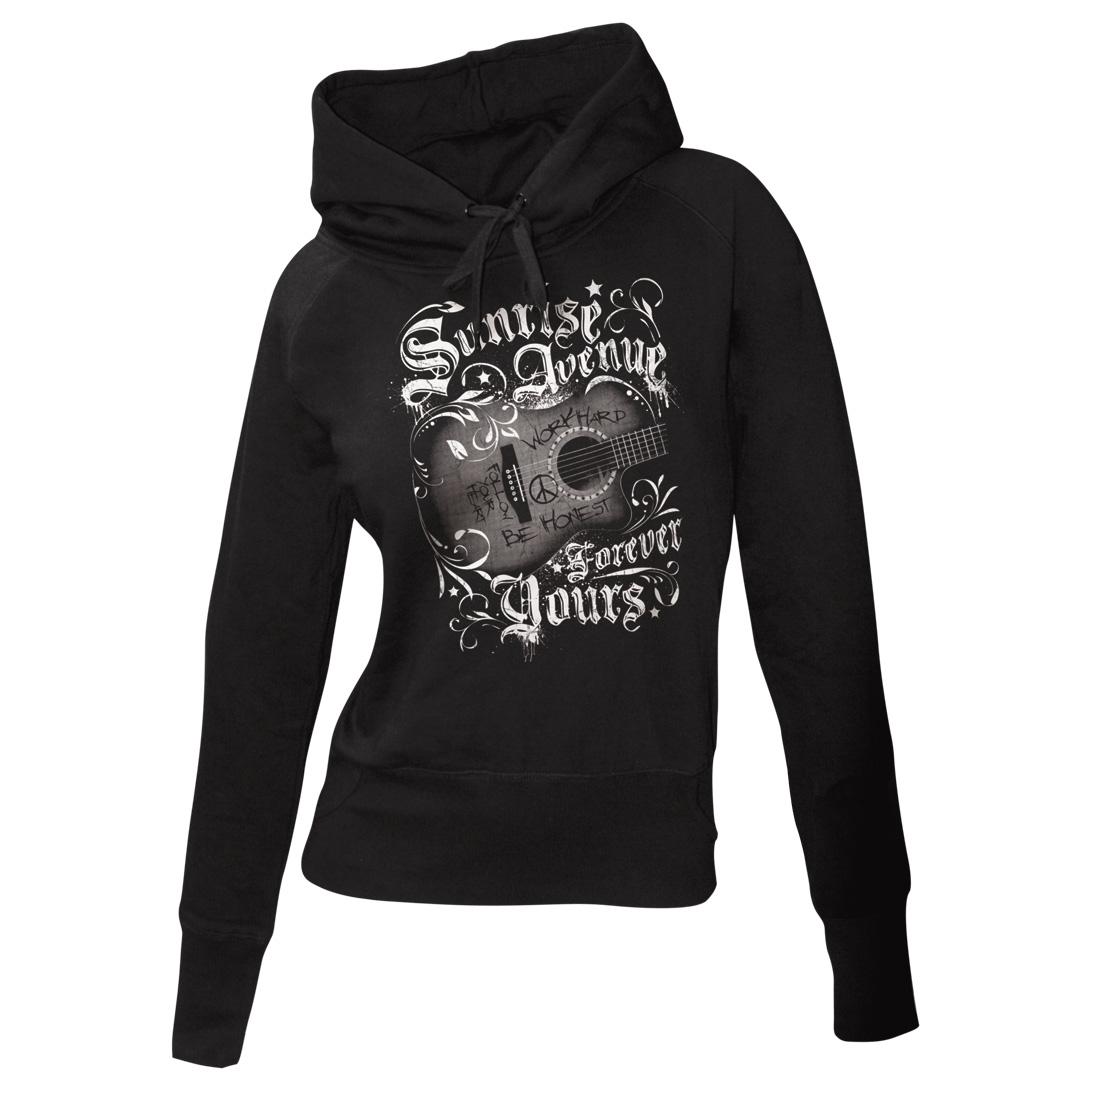 √Forever Yours von Sunrise Avenue - Girlie hooded sweater jetzt im Sunrise Avenue Shop